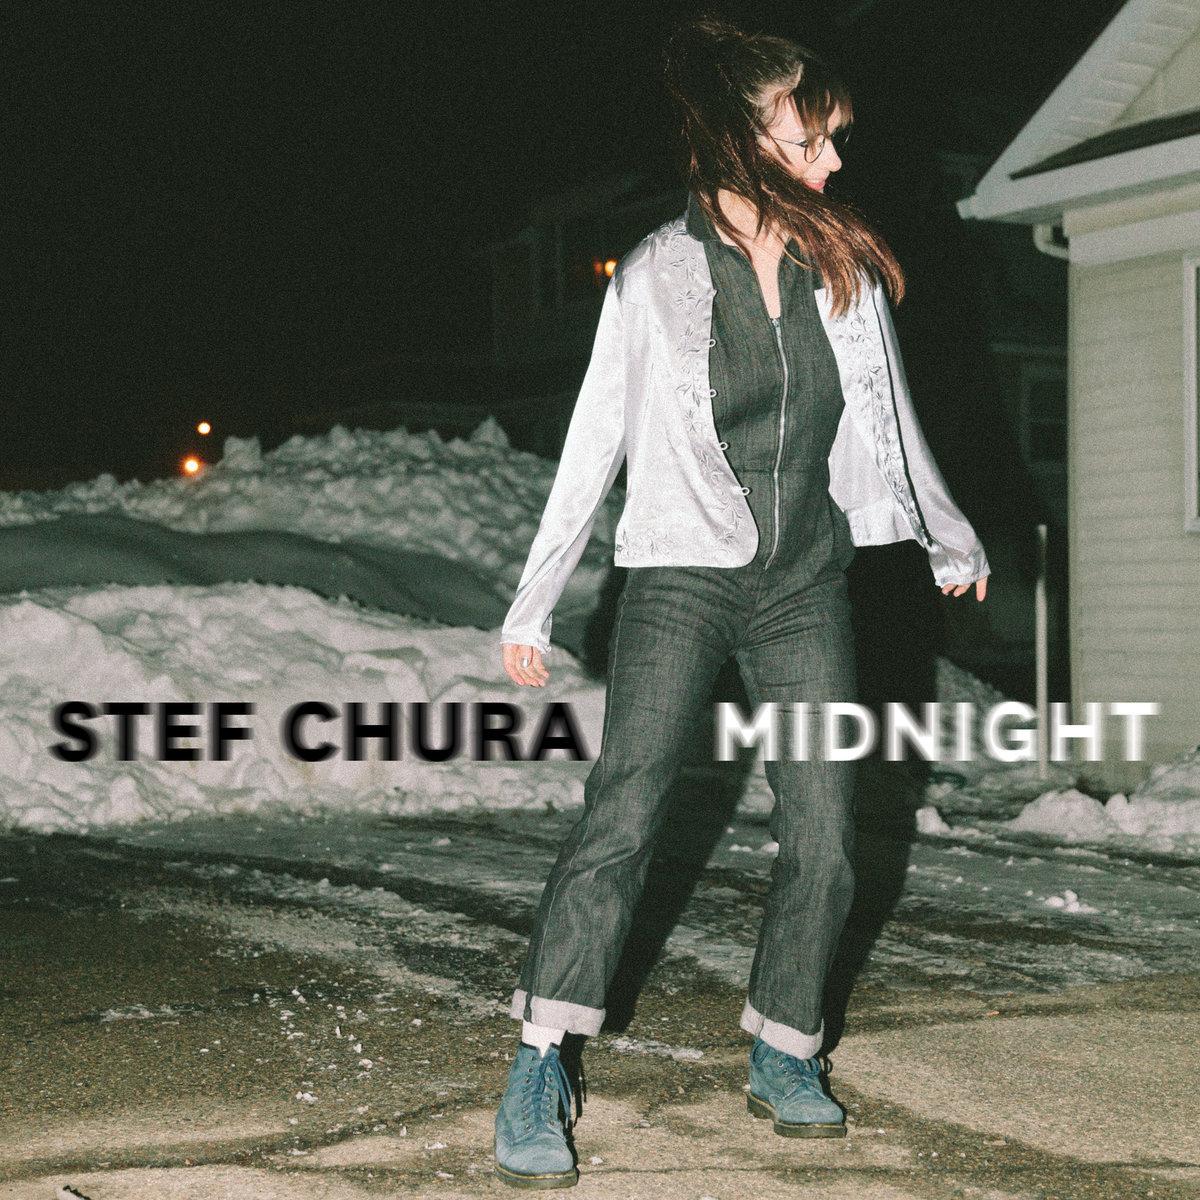 Mejores discos de 2019 - Página 3 Stef-Chura-Midnight